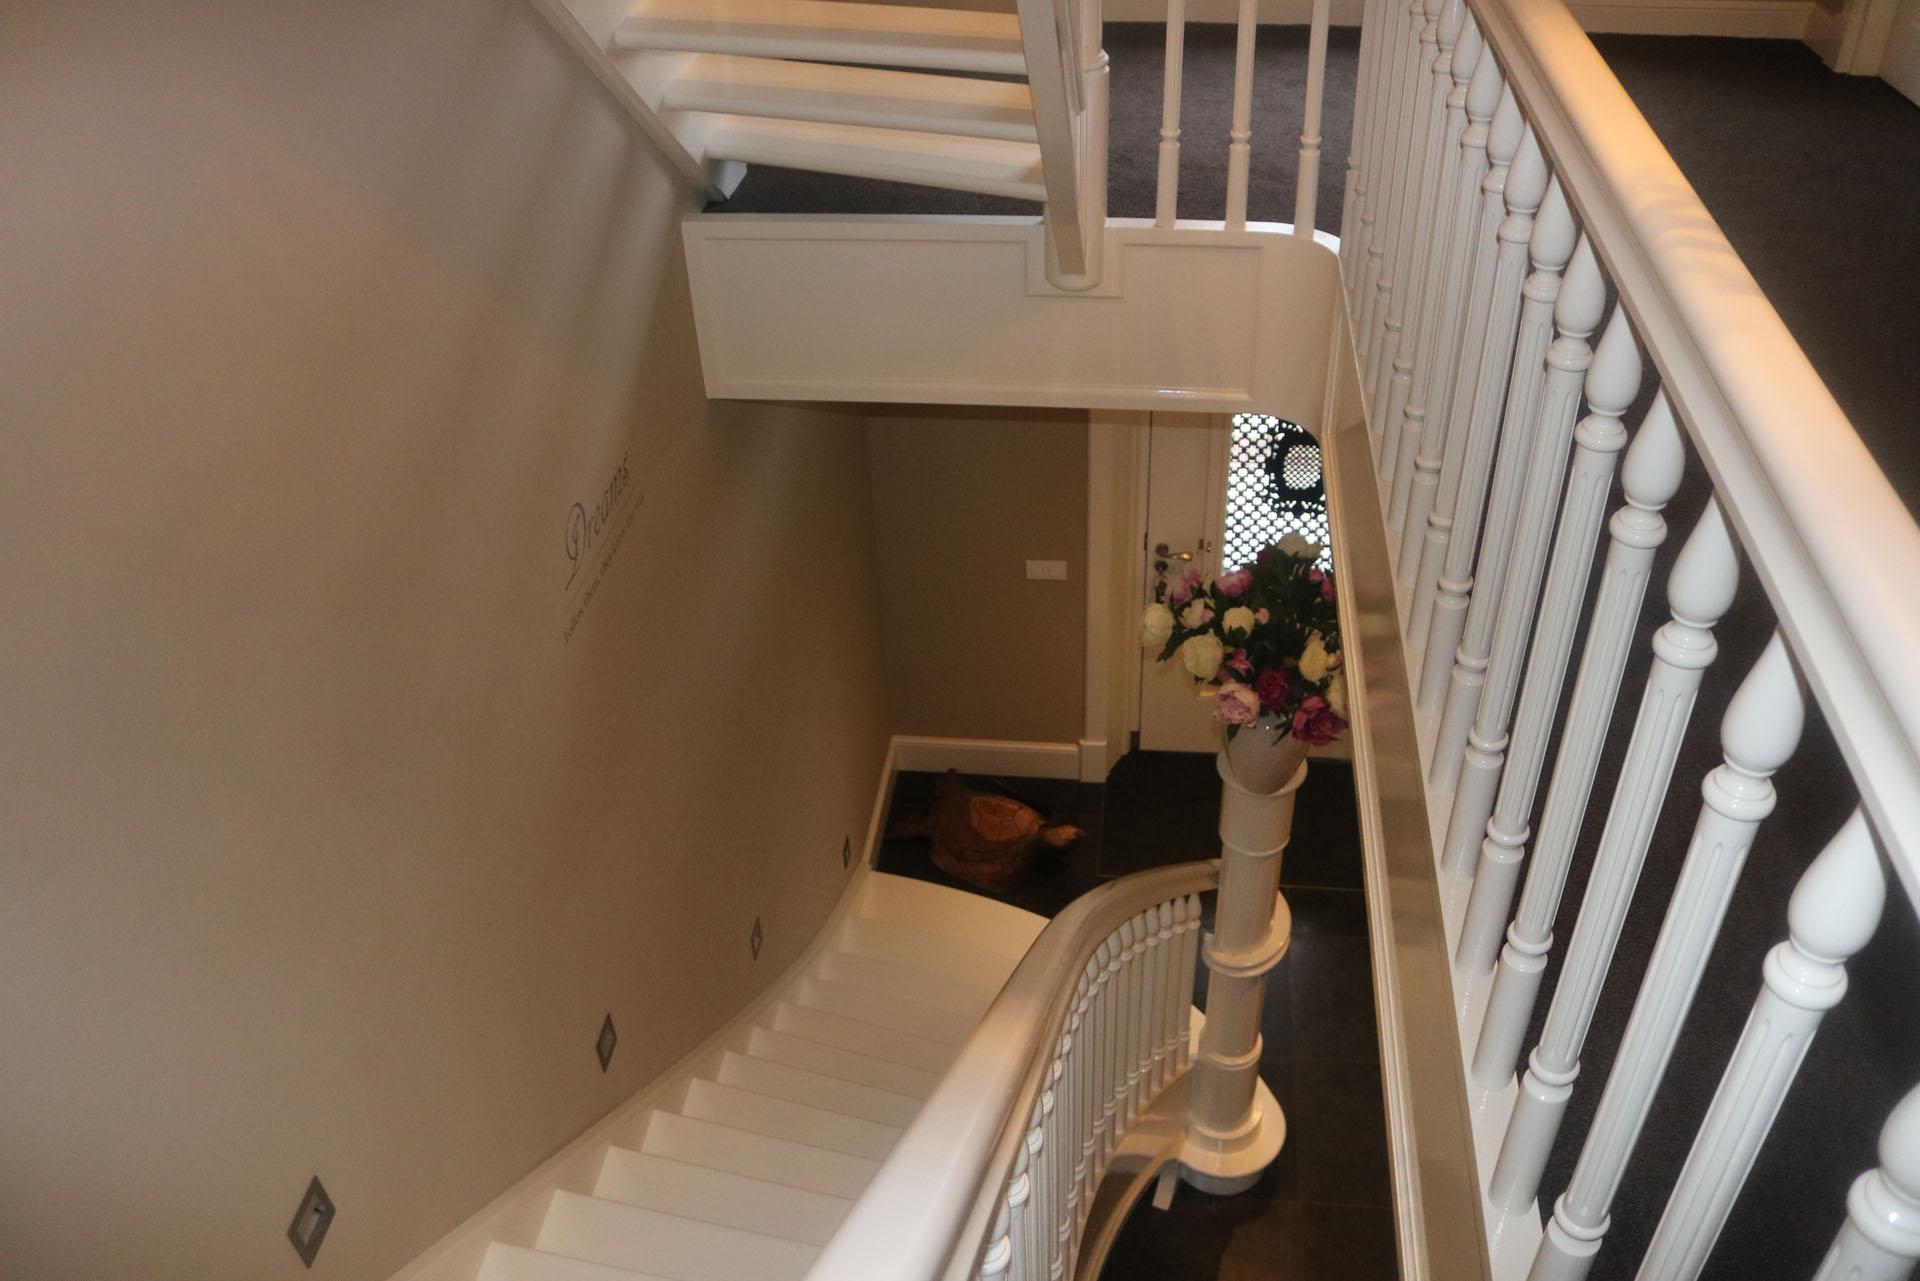 Klassieke witte beukenhouten trap met uitwaaierende for Trap hout wit